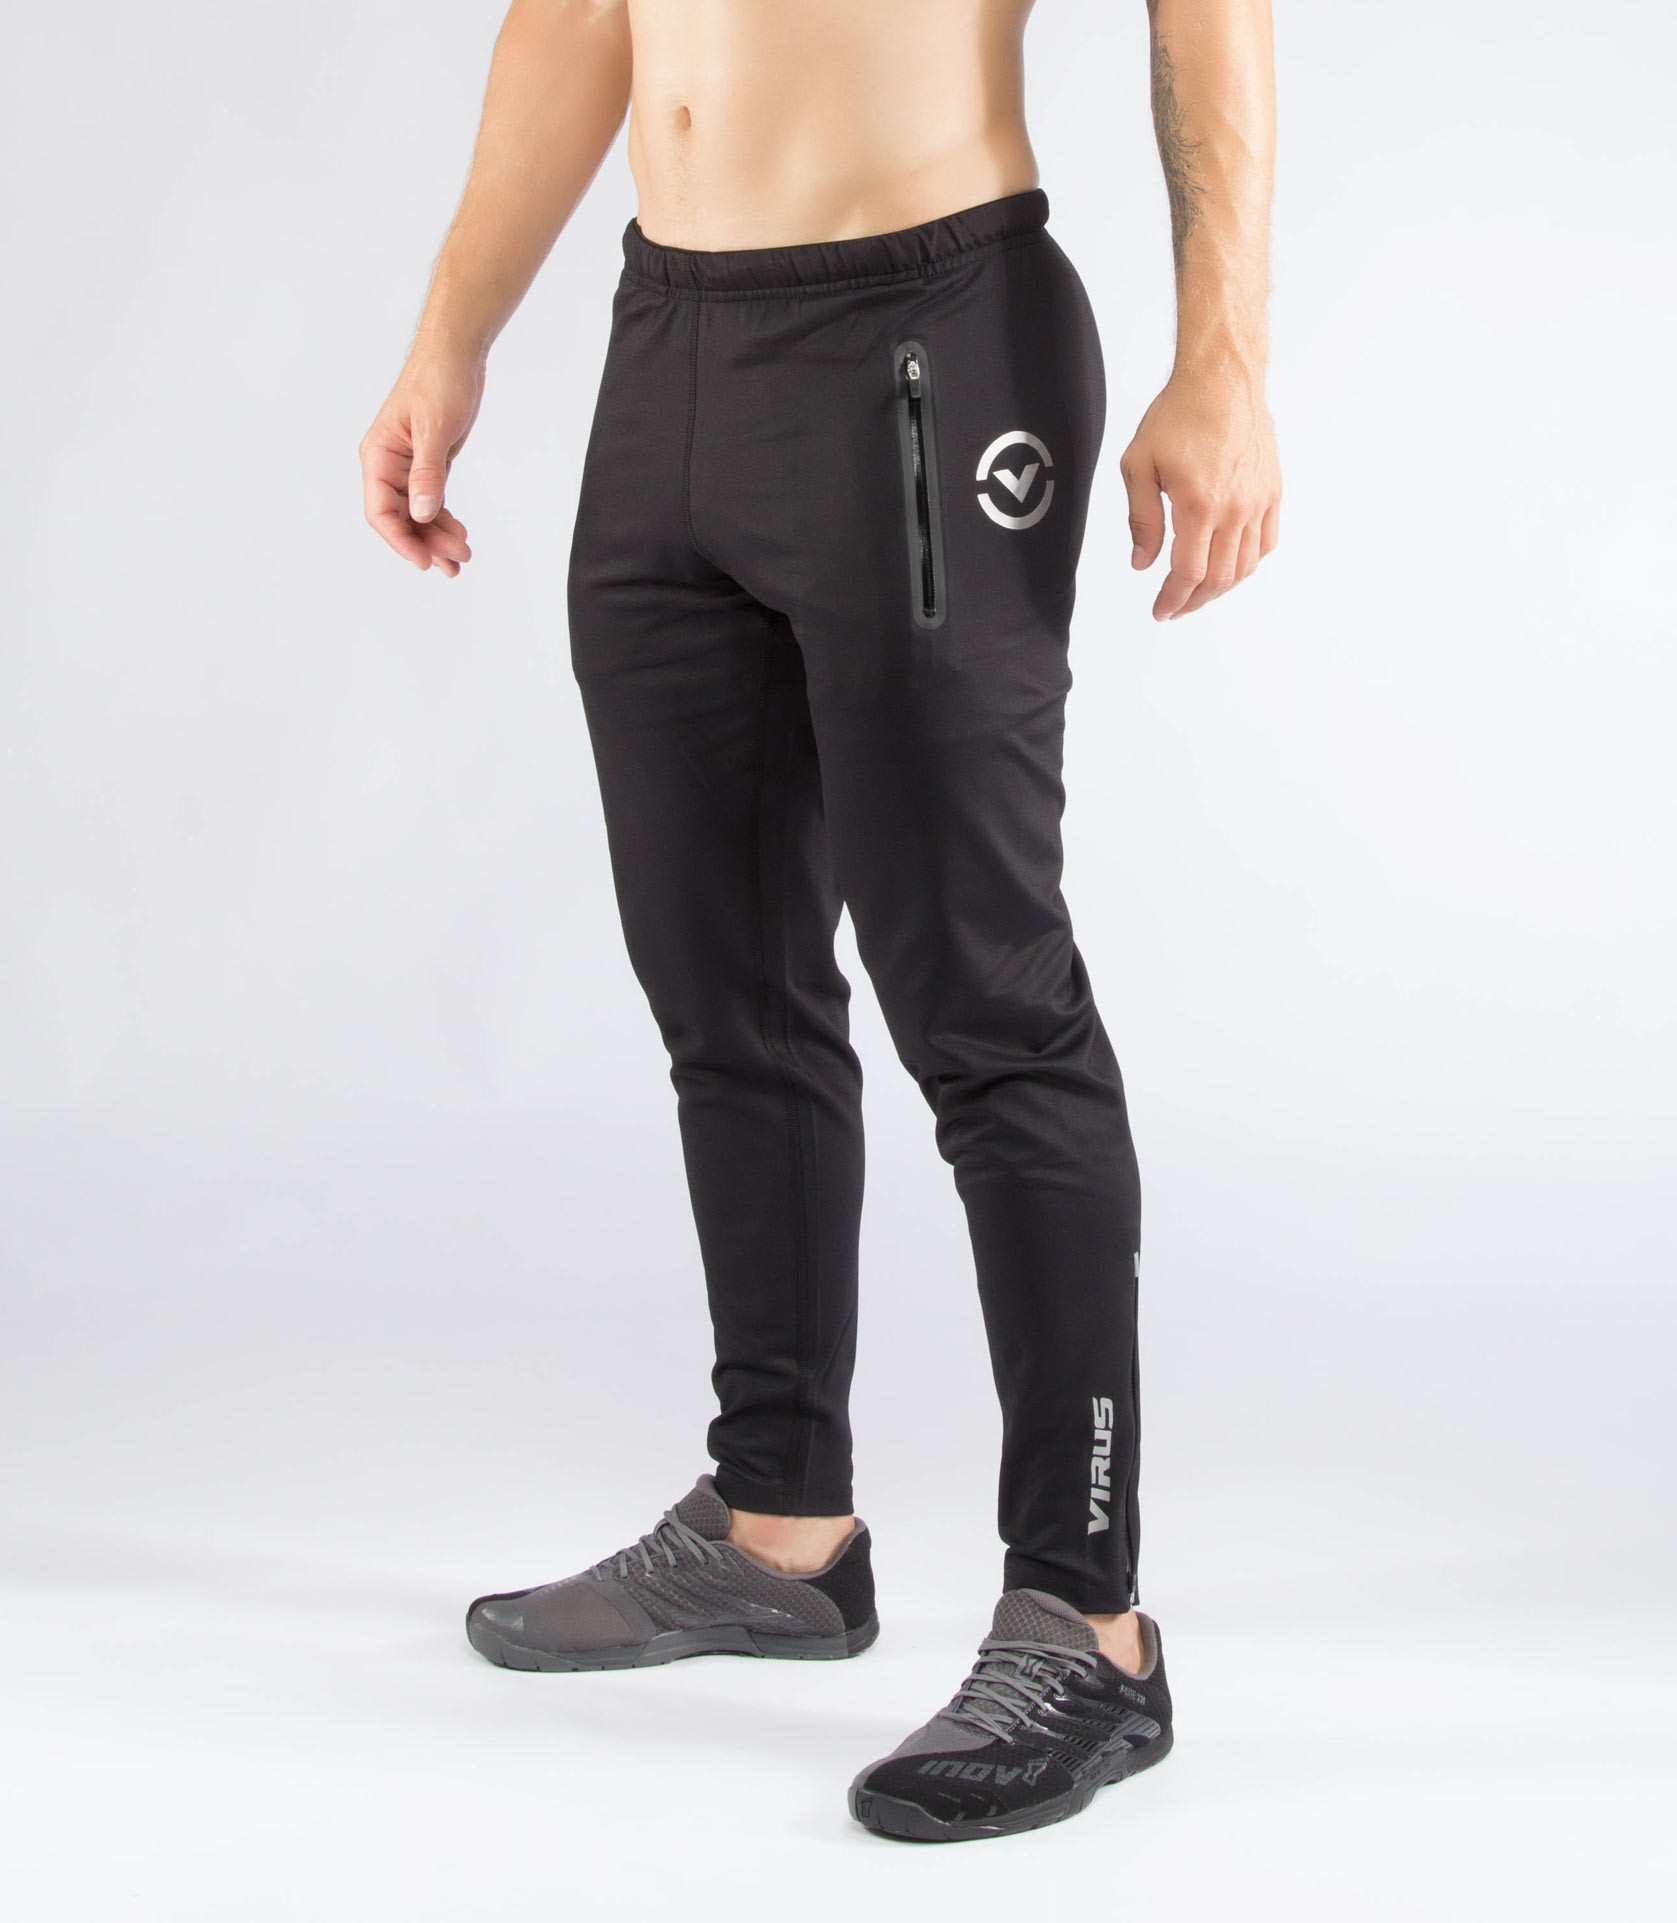 Au15男子KL1生物能能量恢復褲